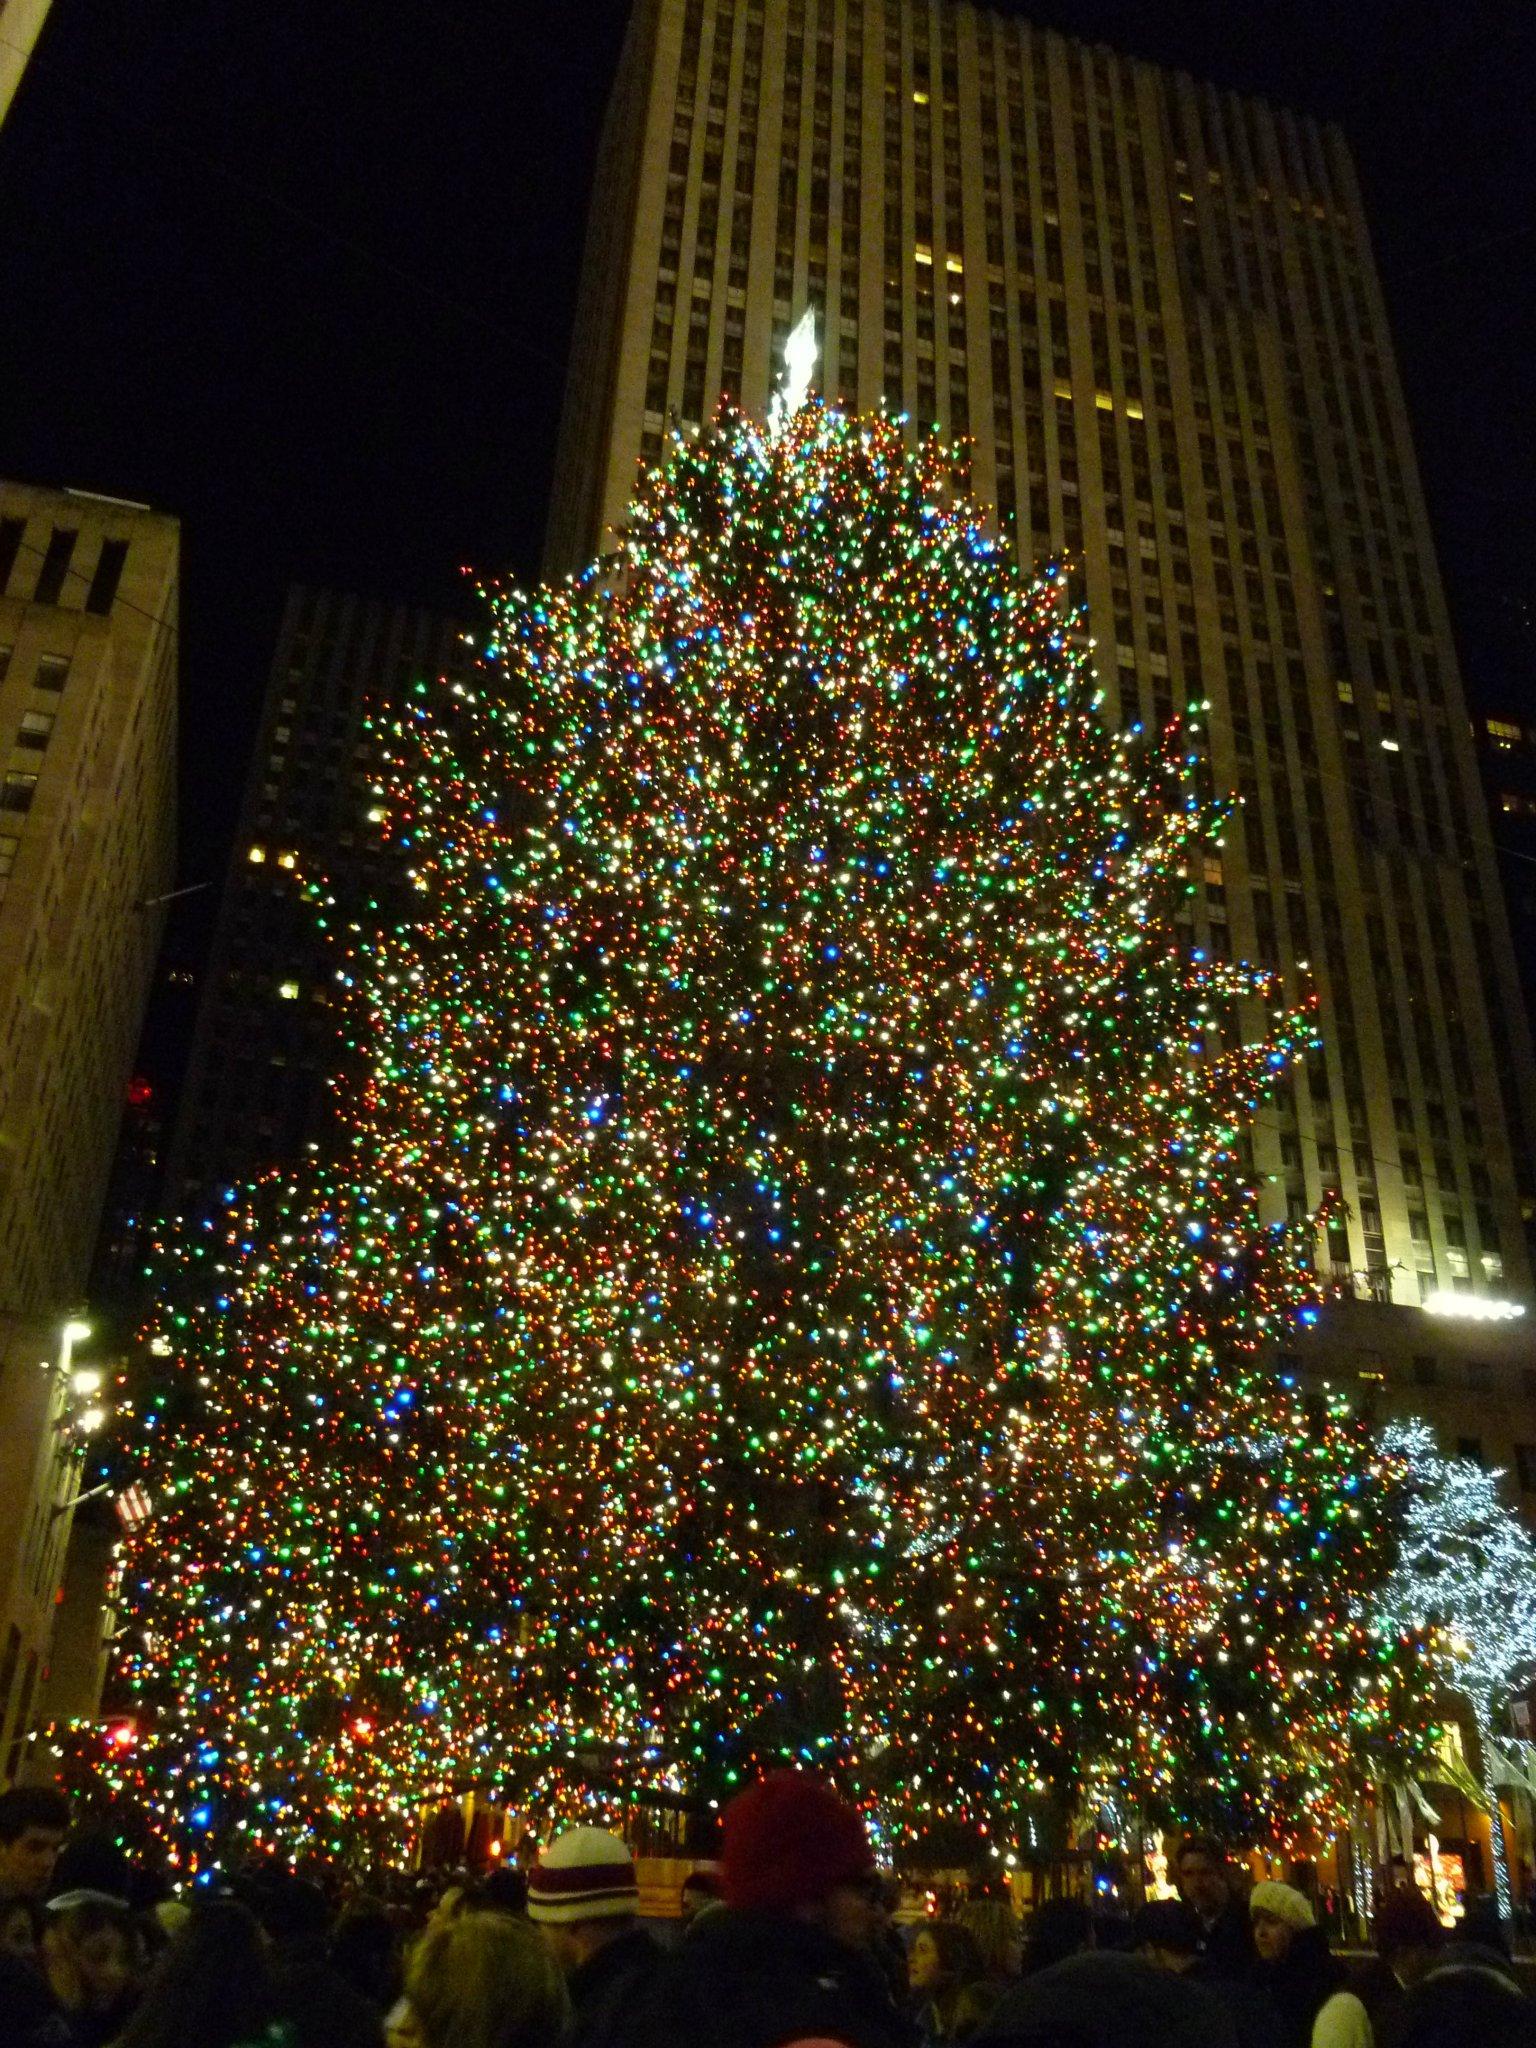 The Rockfeller Christmas Tree